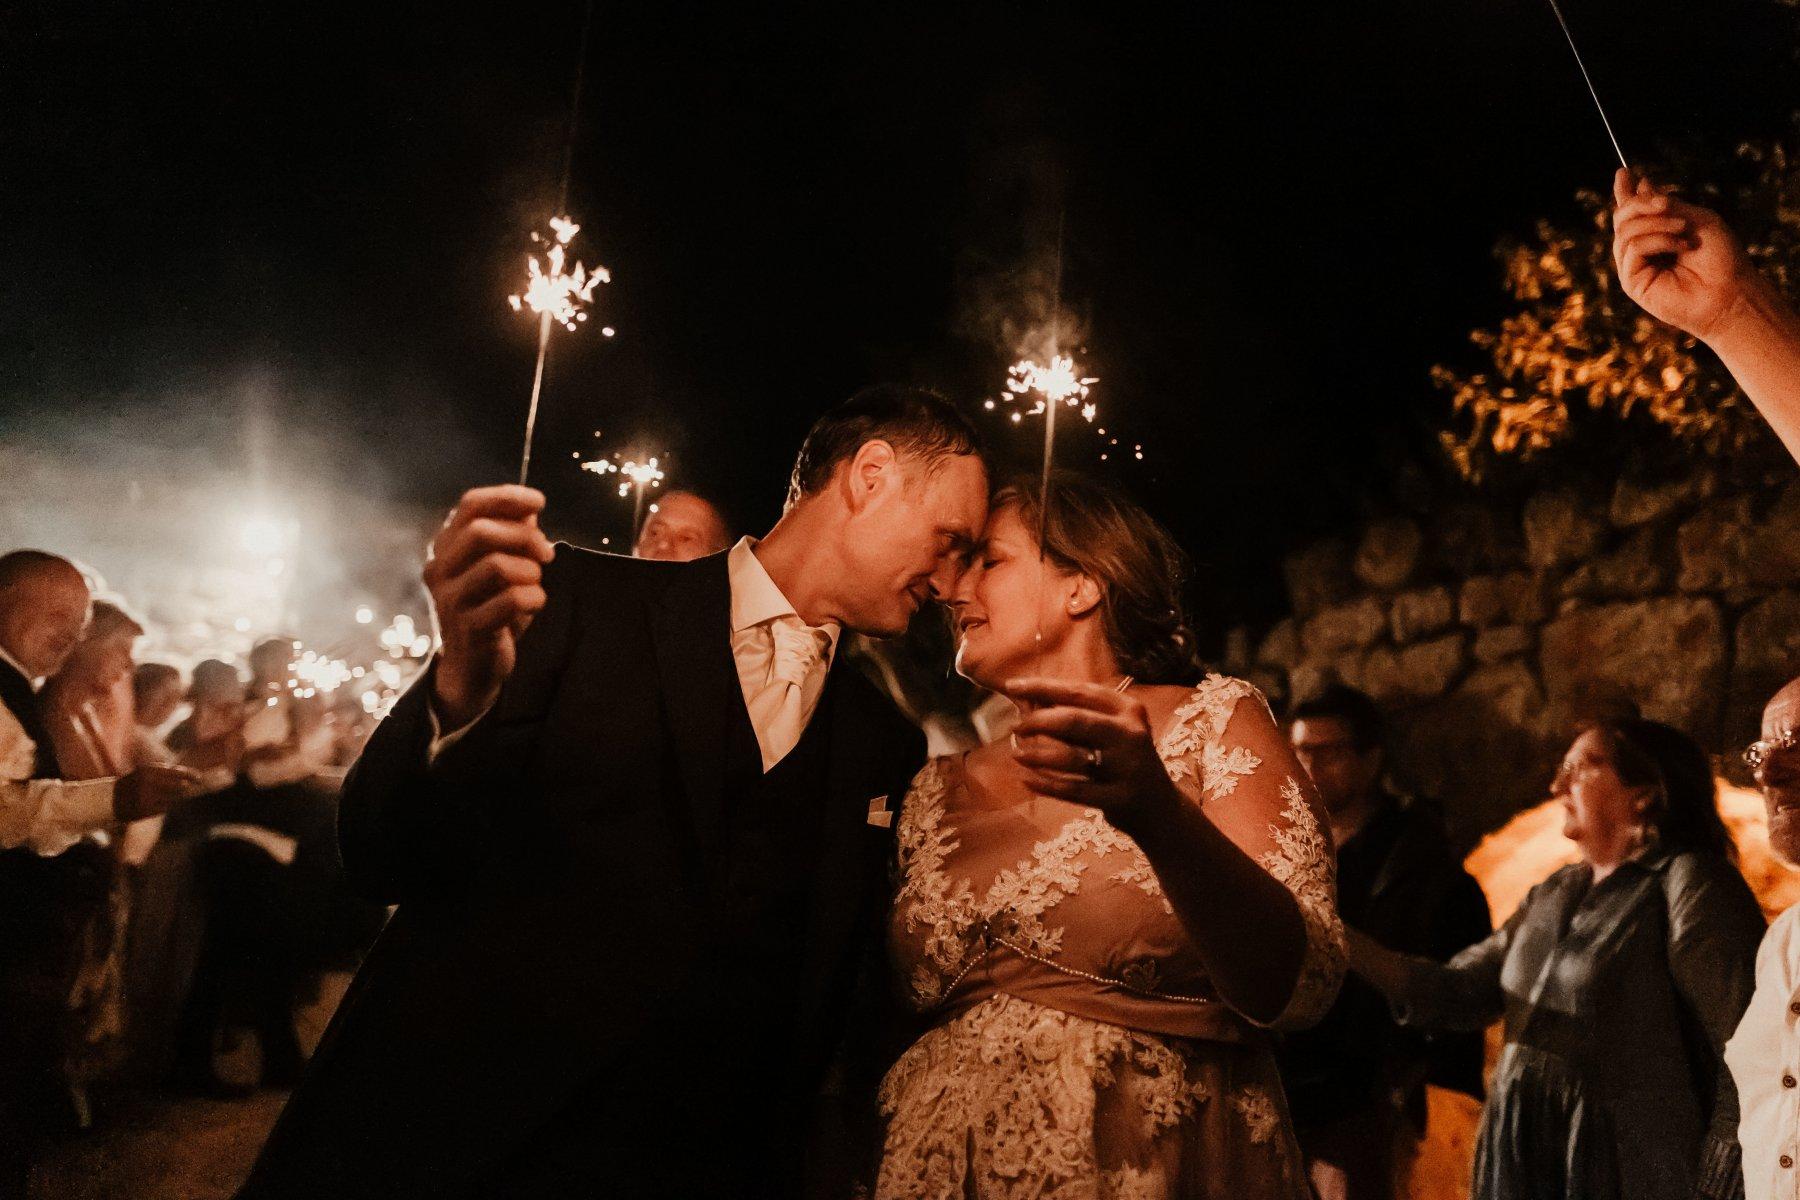 1_florinejeannot-mariage-muriel-jerome-belleepoque-823